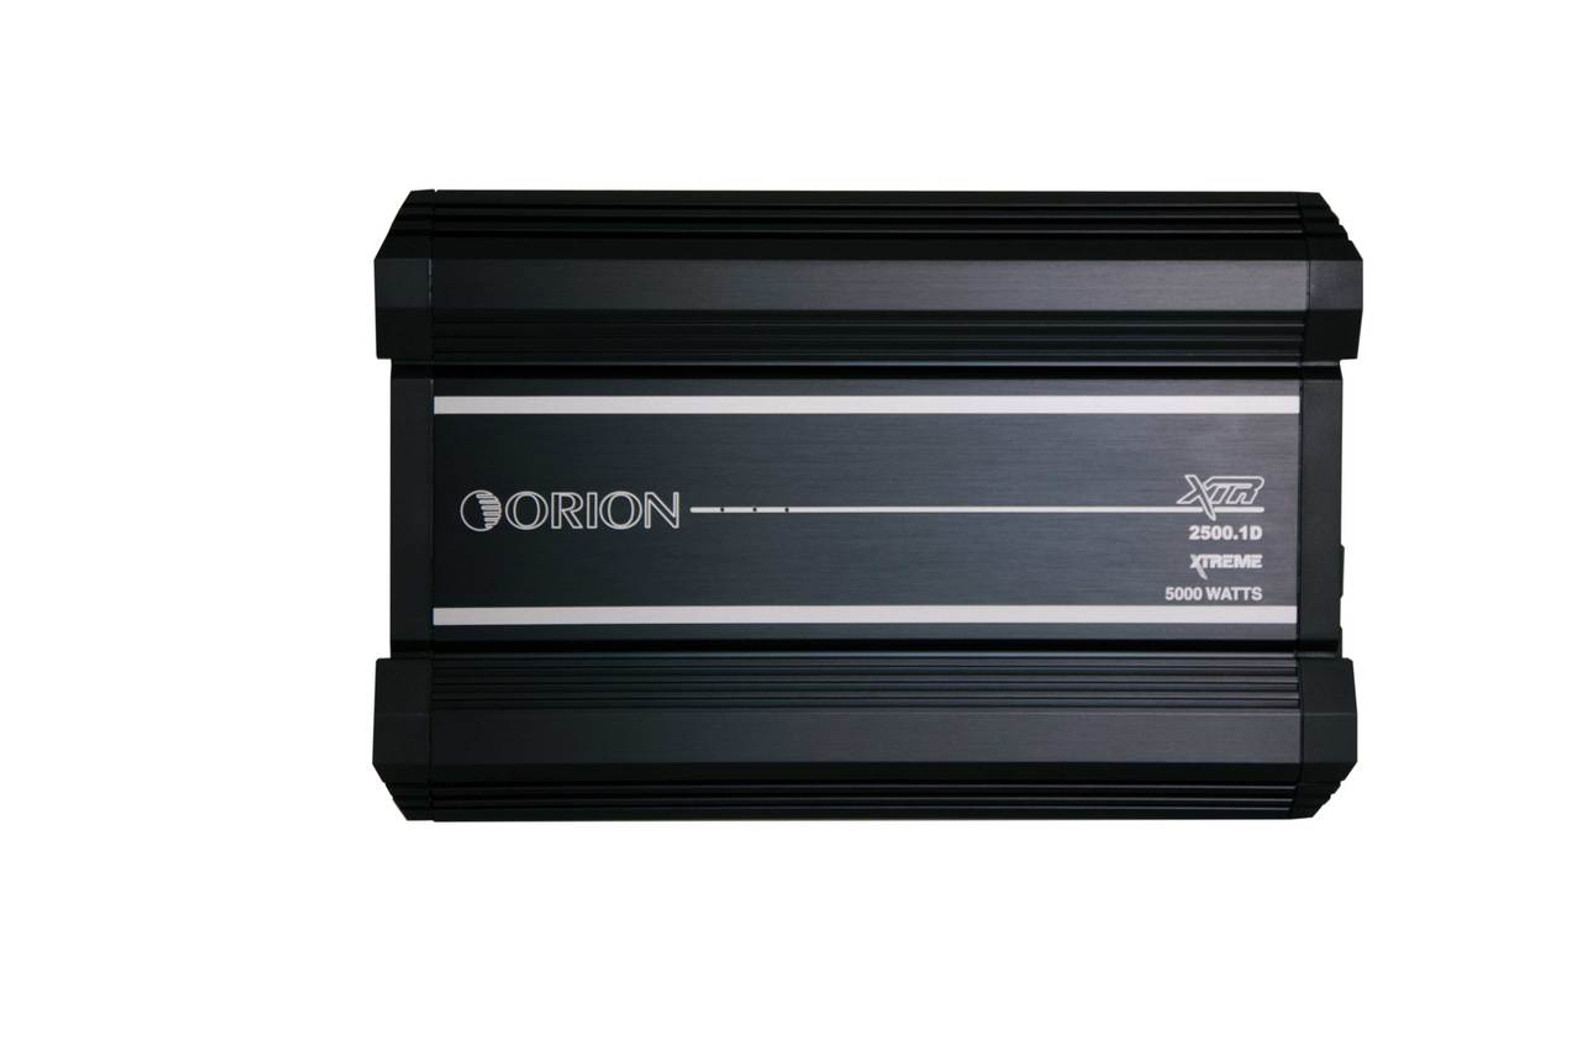 hight resolution of orion xtr xtr2500 1dz class d amplifier 2500 watts rms 1 ohm ssa orion amplifier wiring diagram source orion car audio